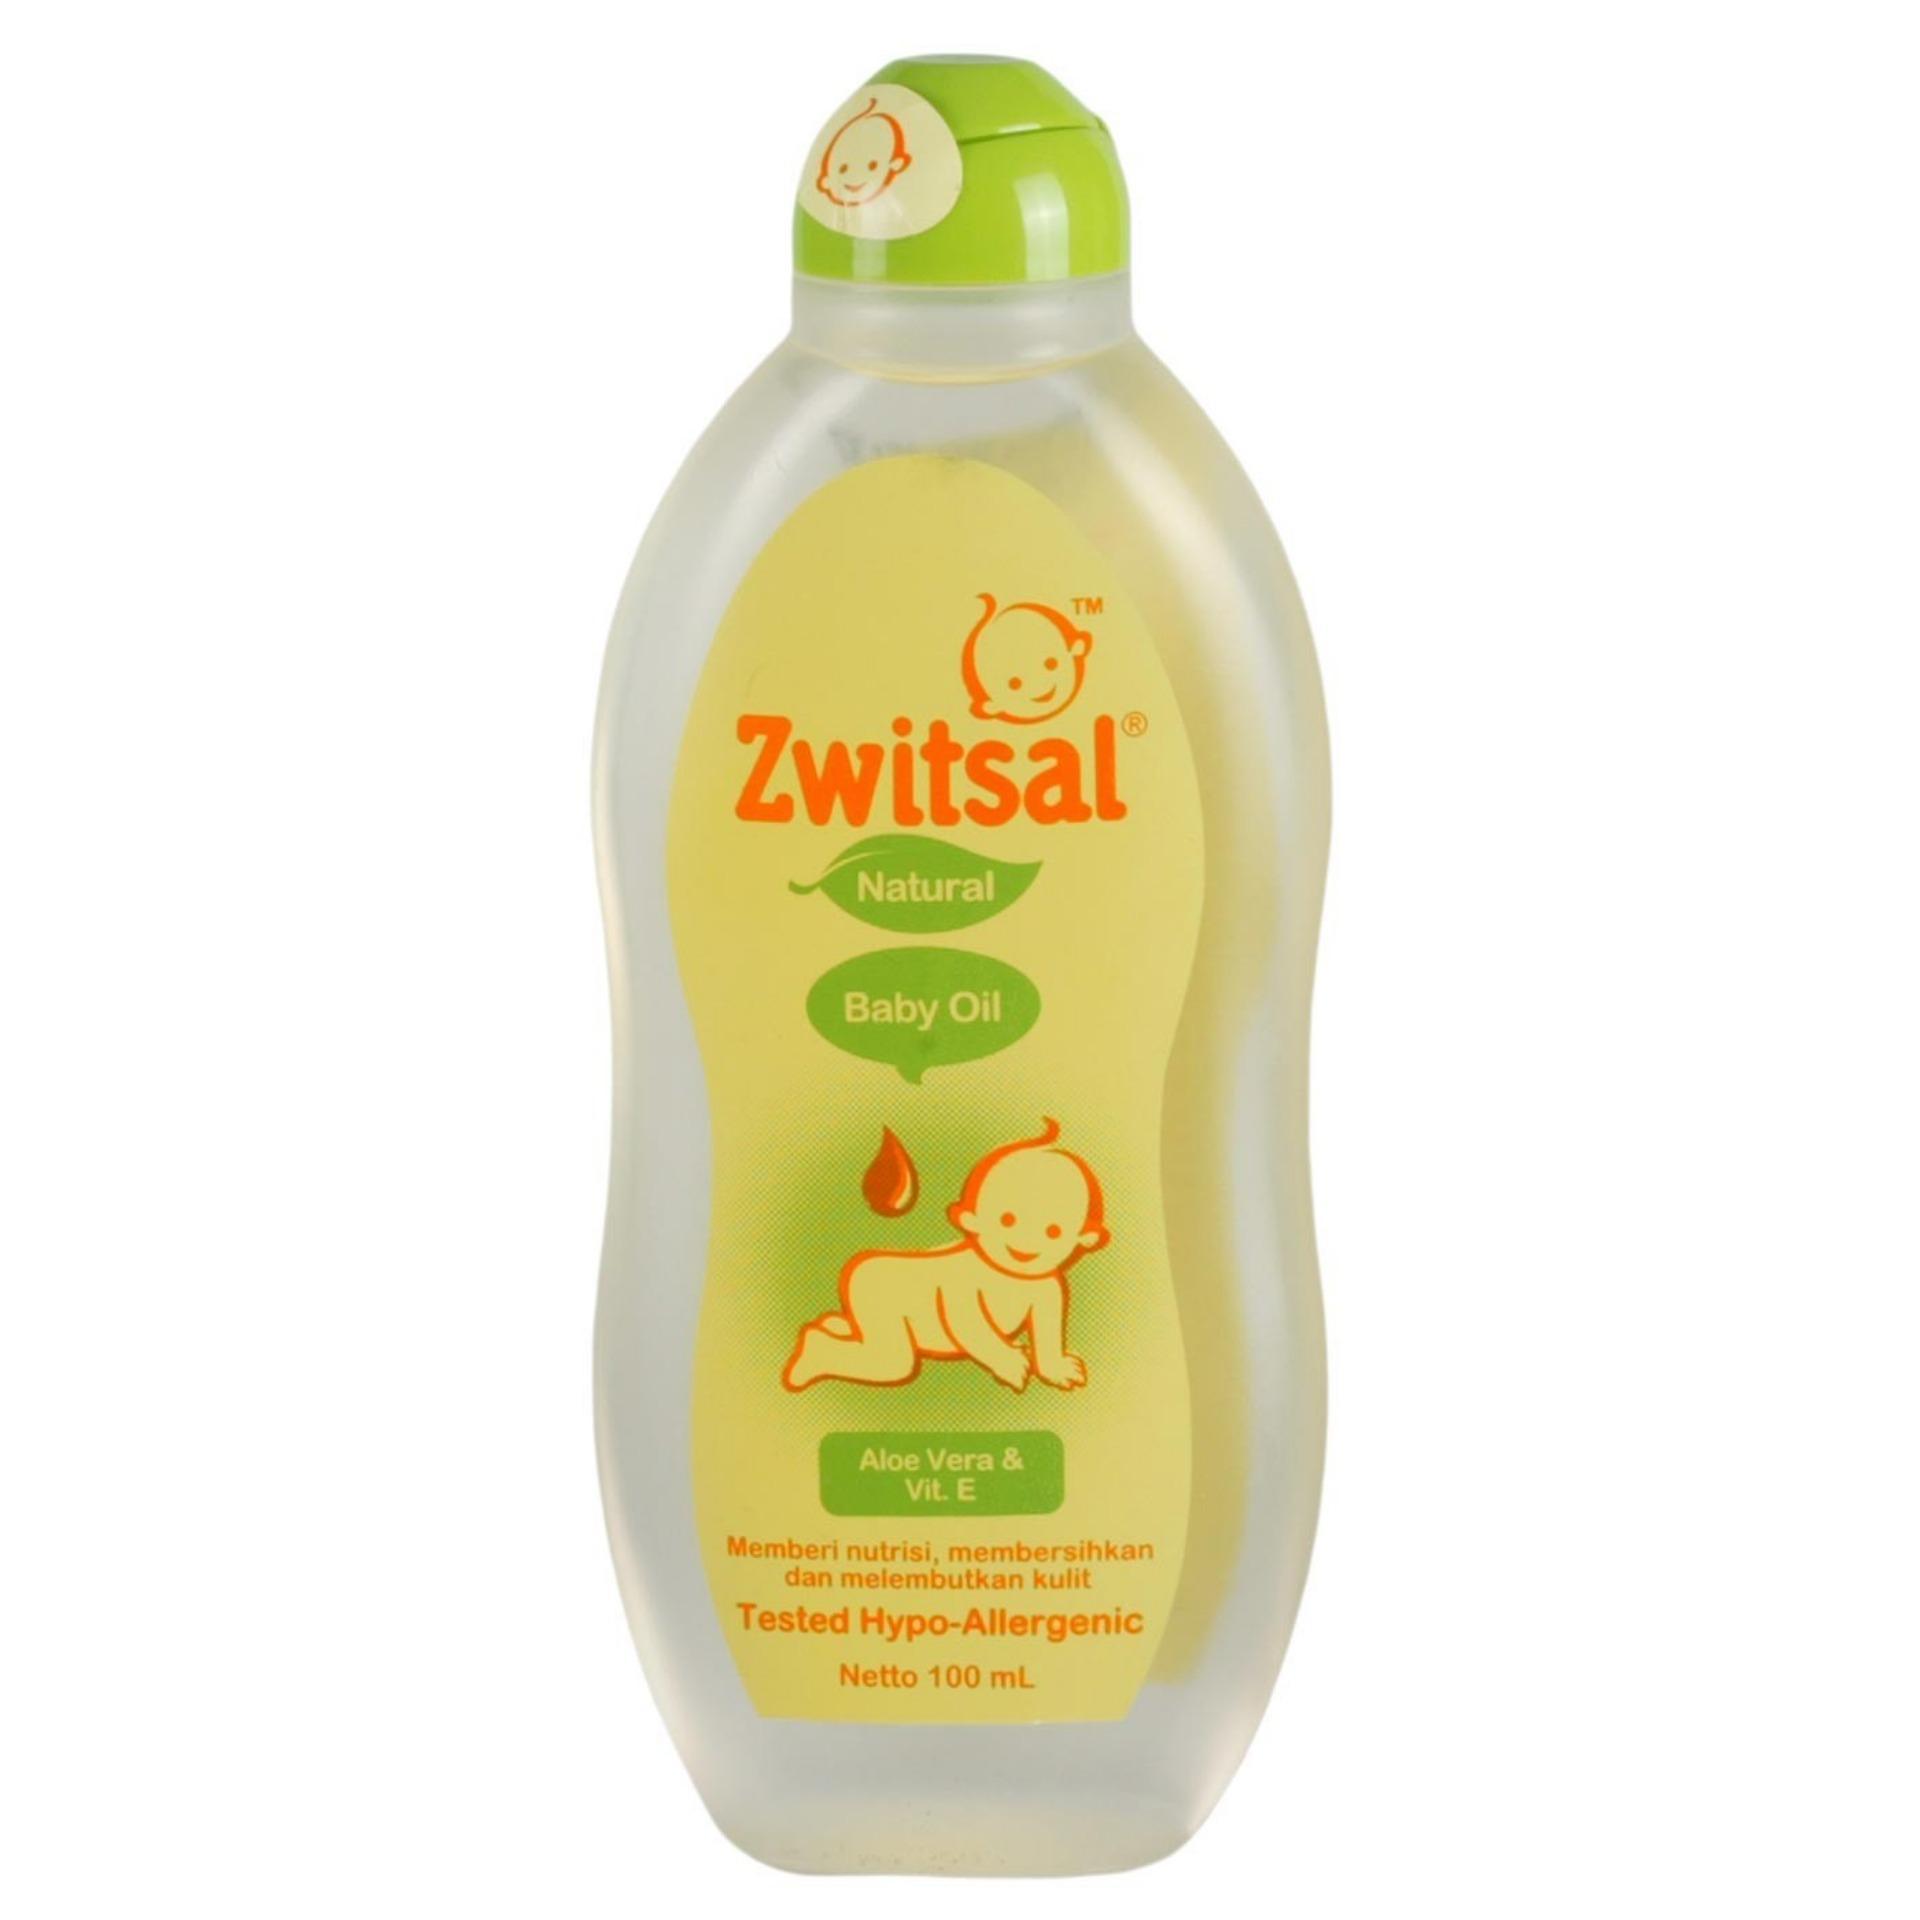 Zwitsal Baby Bar Soap Classic 80gr Daftar Harga Terlengkap Indonesia Lyv Natural Zaitun Sabun Bayi Alergi Organic Eatable